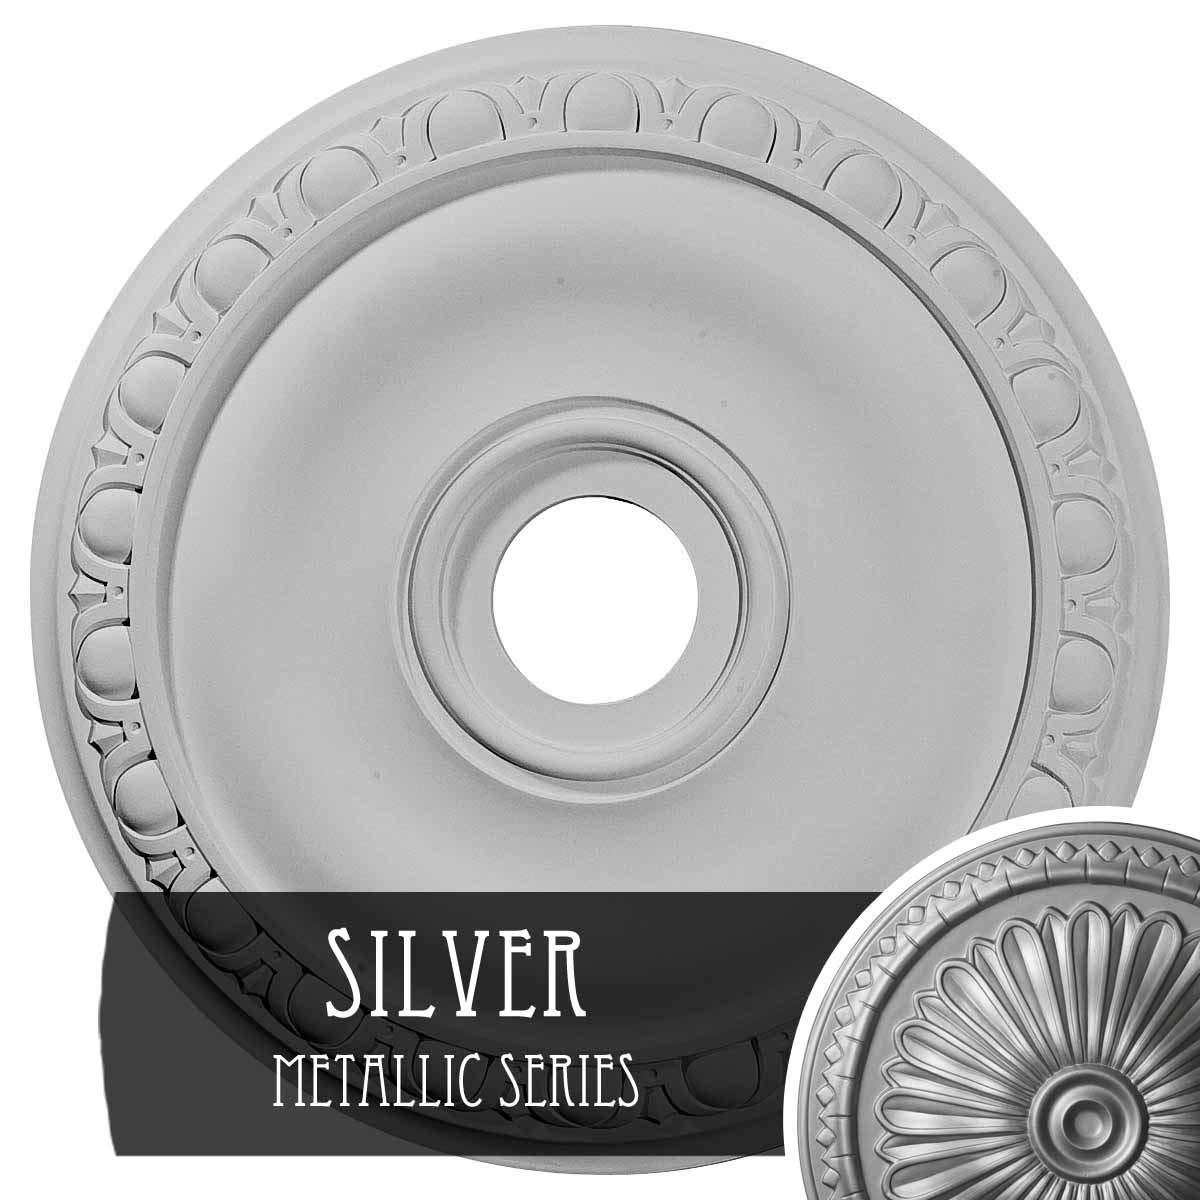 Ekena Millwork CM20JASLS Jackson Ceiling Medallion fits Canopies up to 5 1/8'', Silver by Ekena Millwork (Image #1)